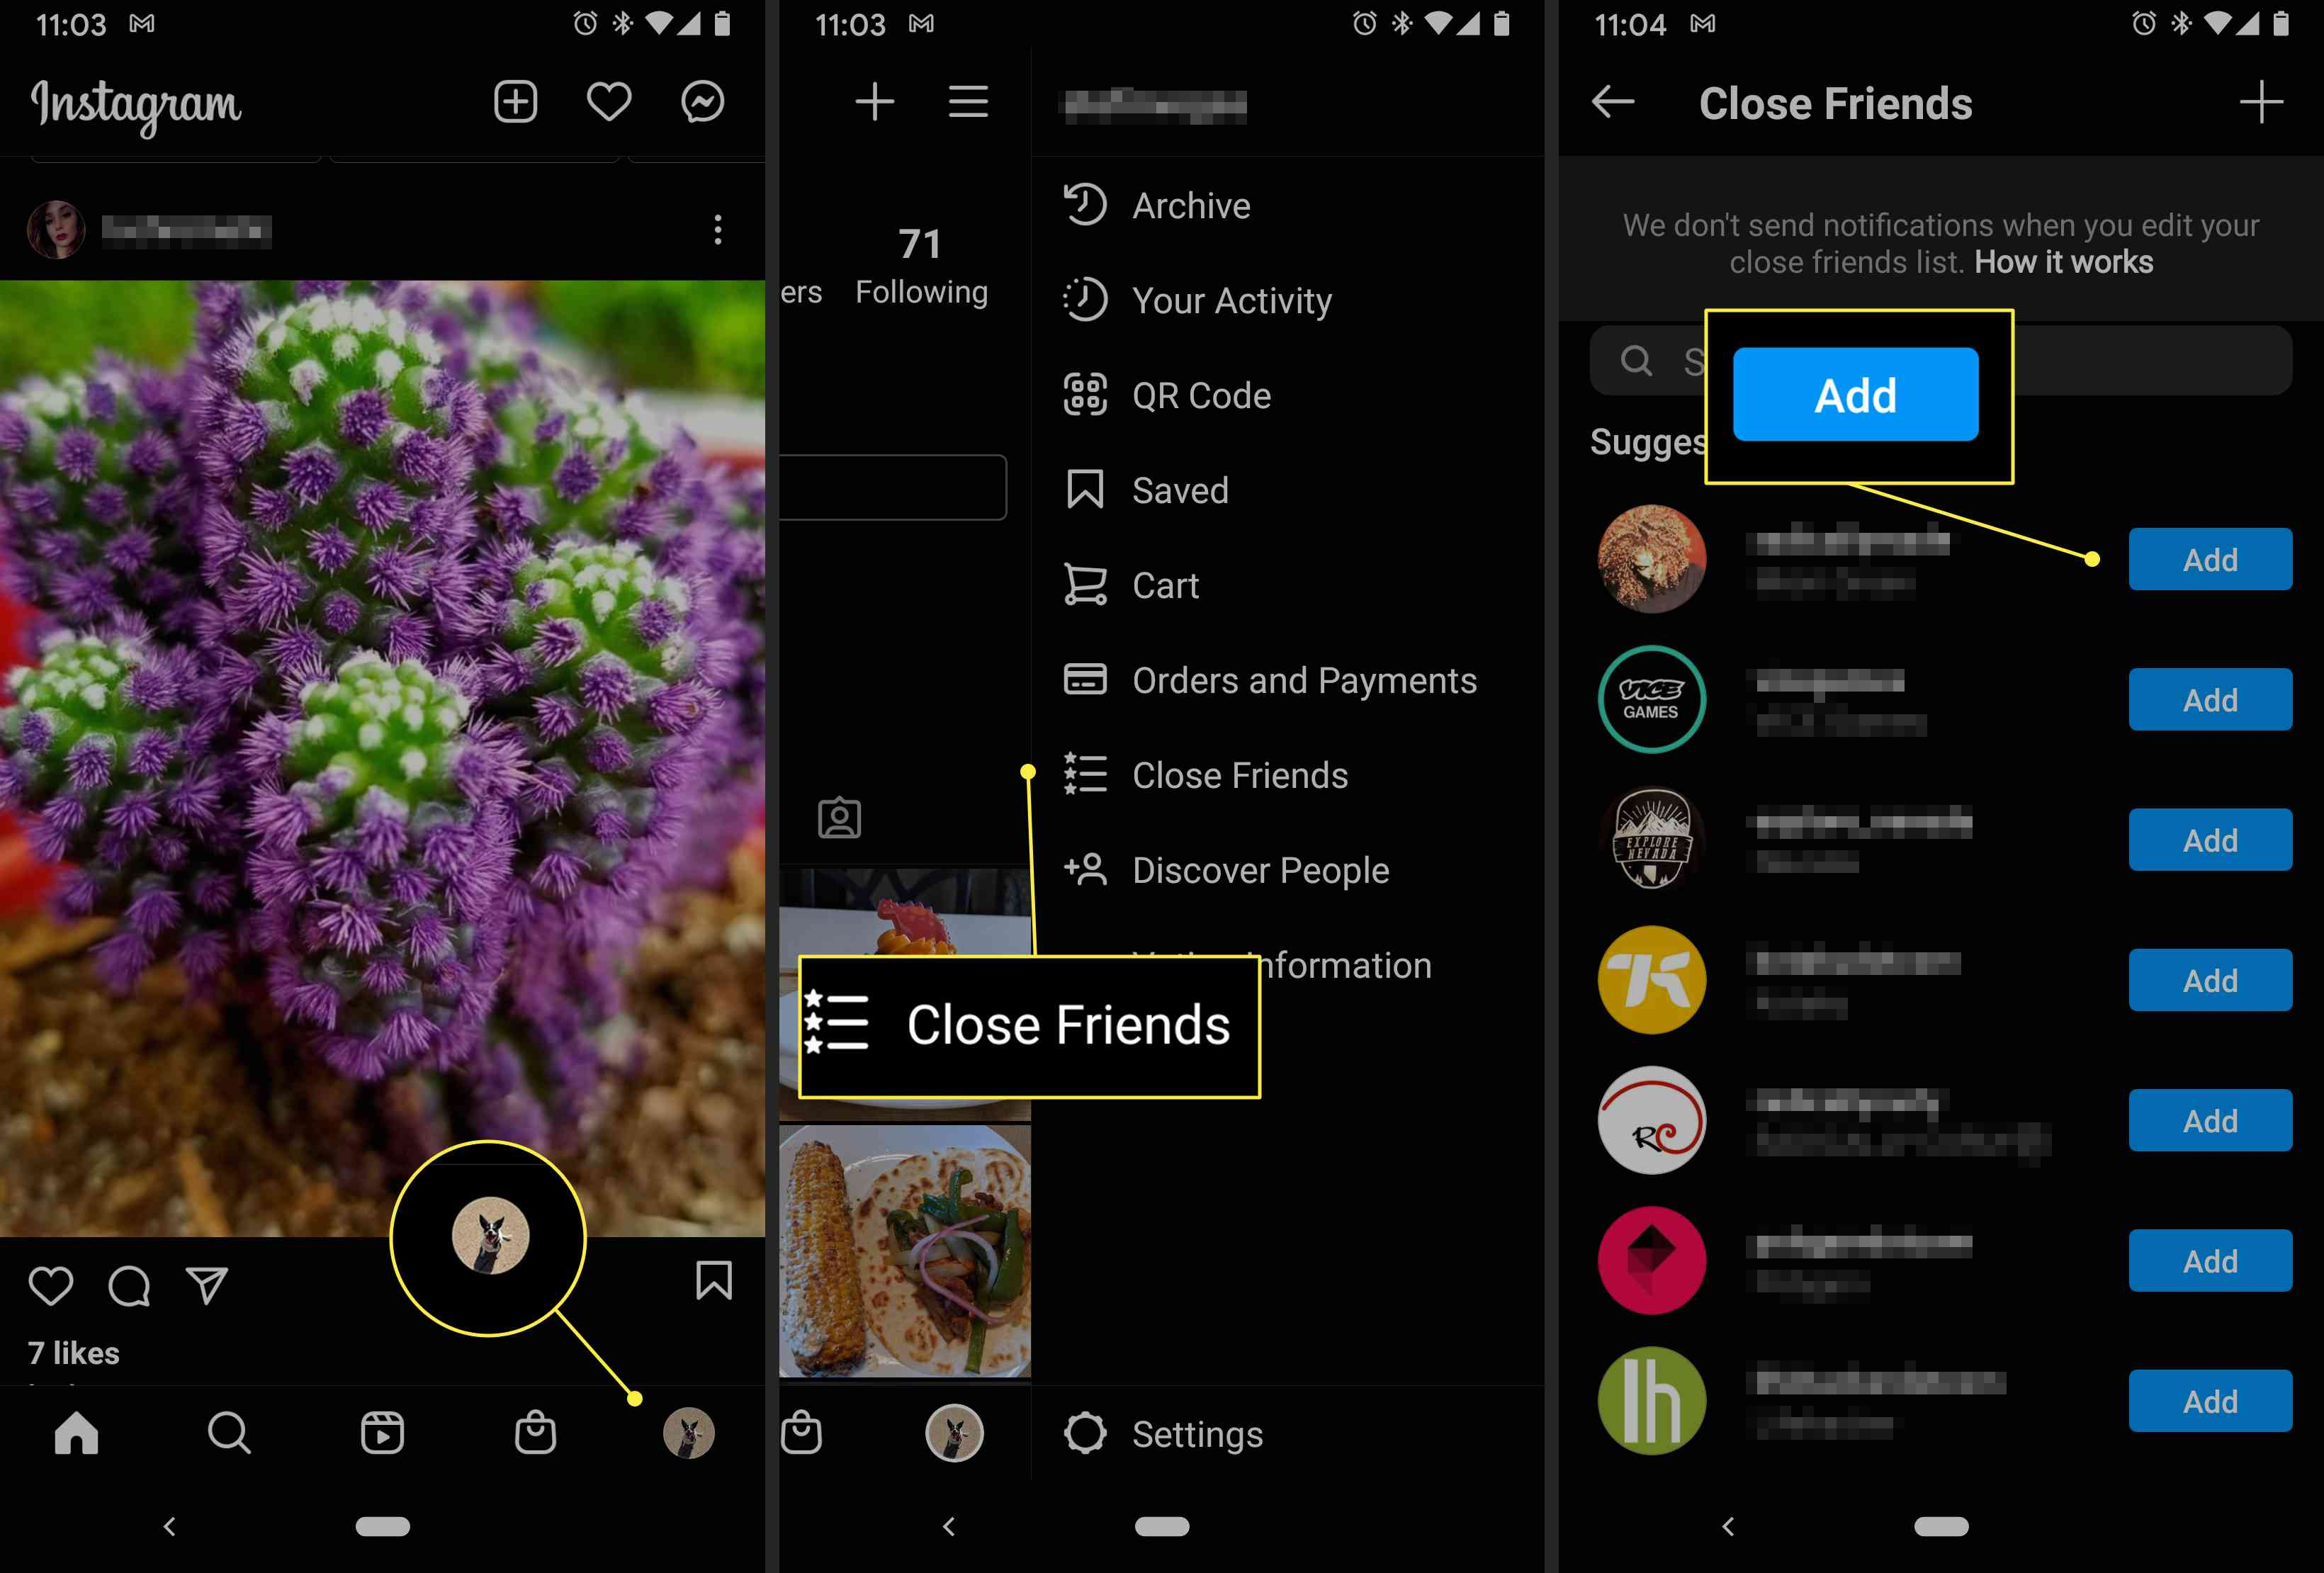 An Instagram user accesses their Close Friends list